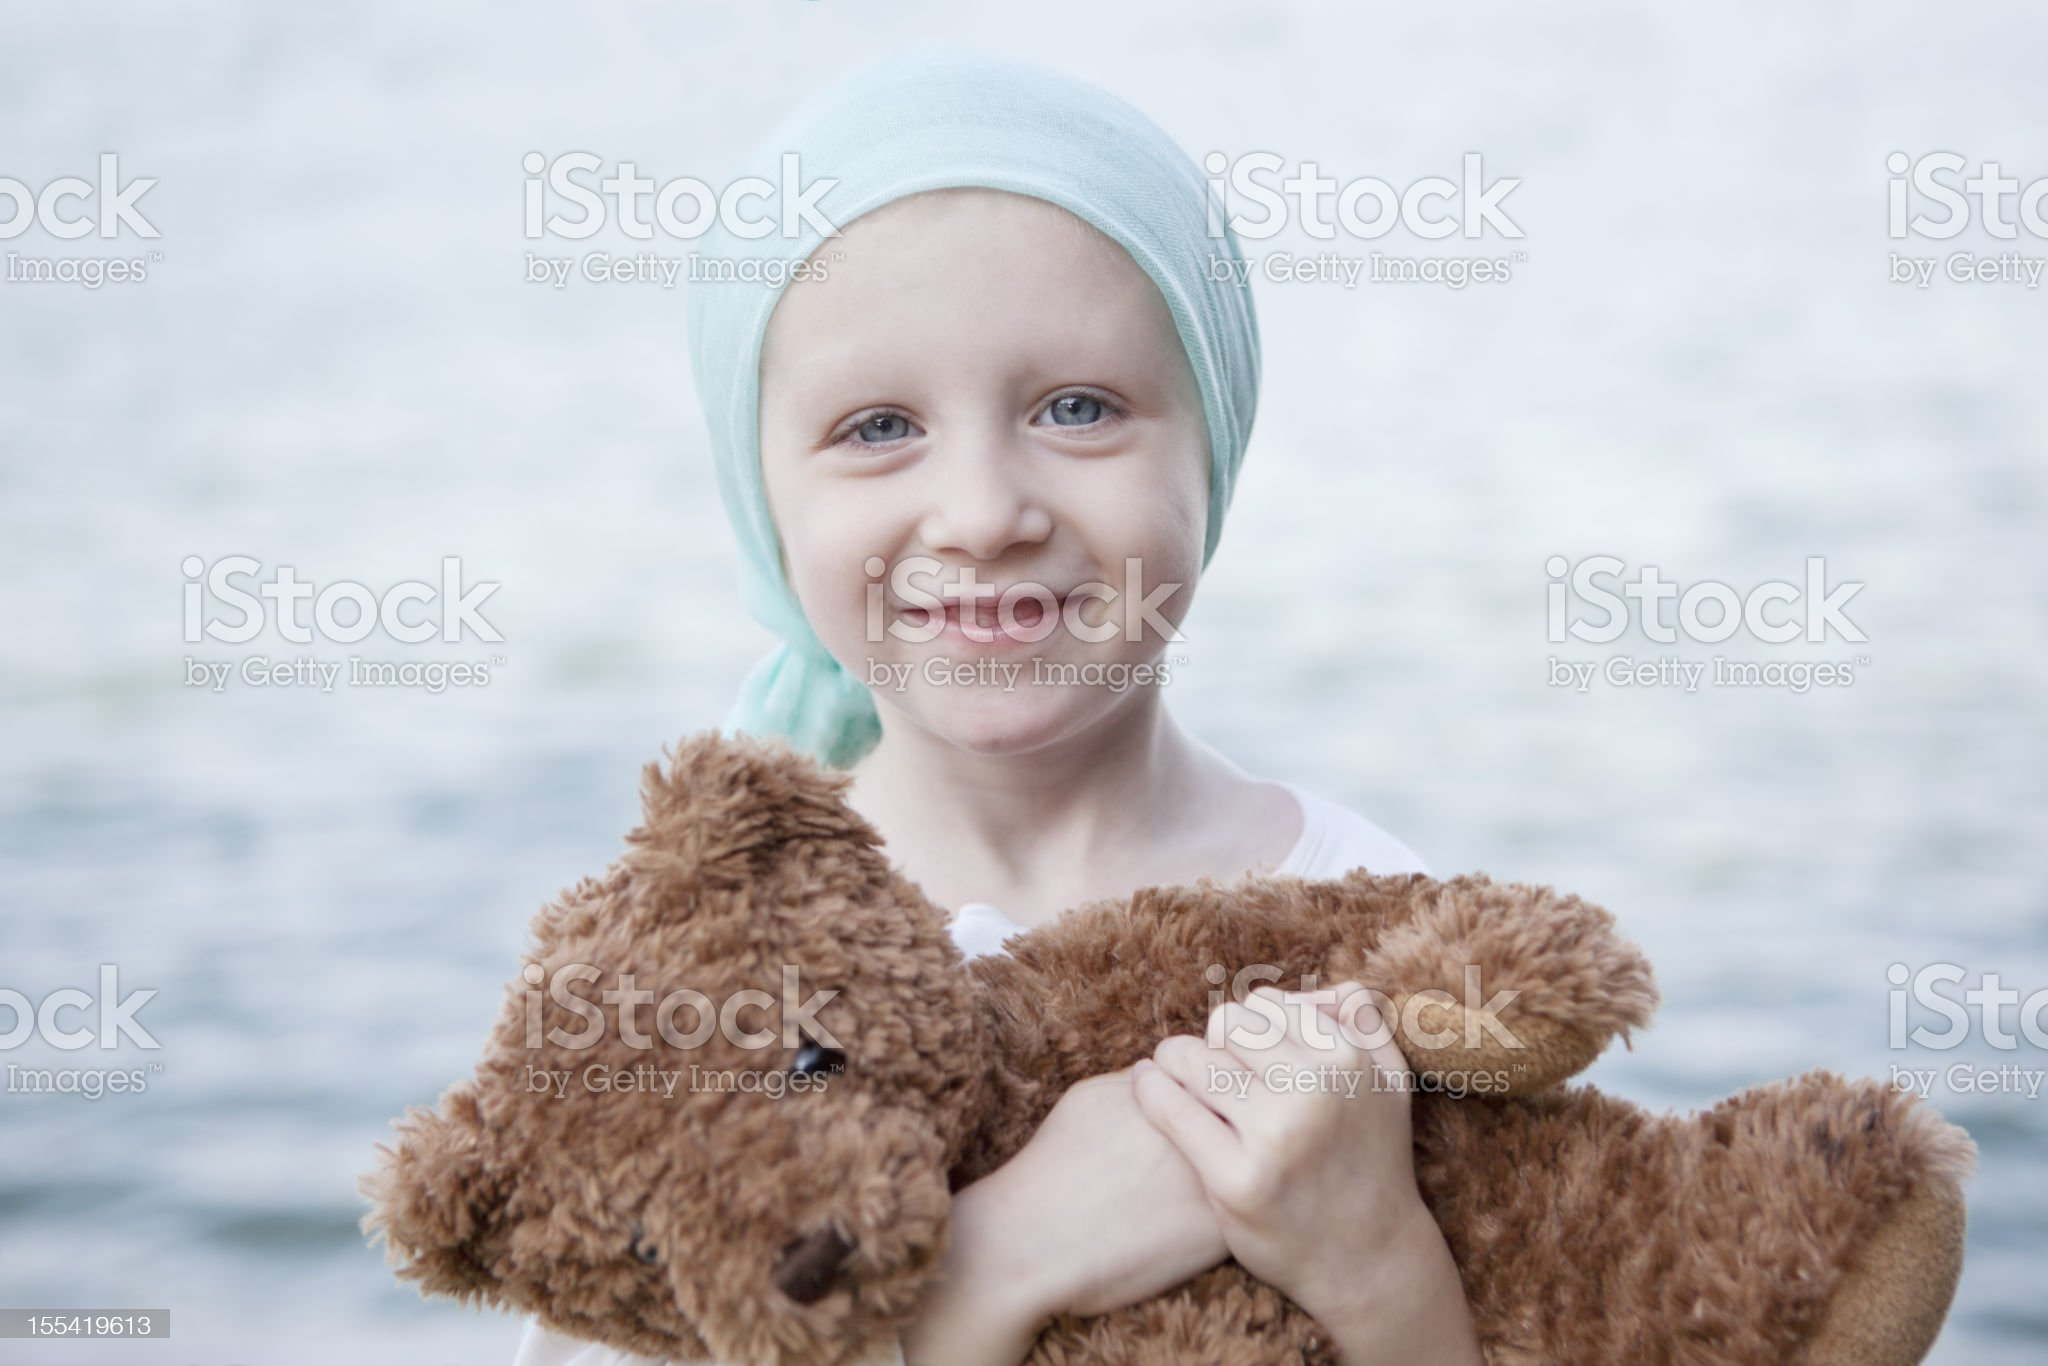 Happy Chemo Girl with Teddy Bear royalty-free stock photo